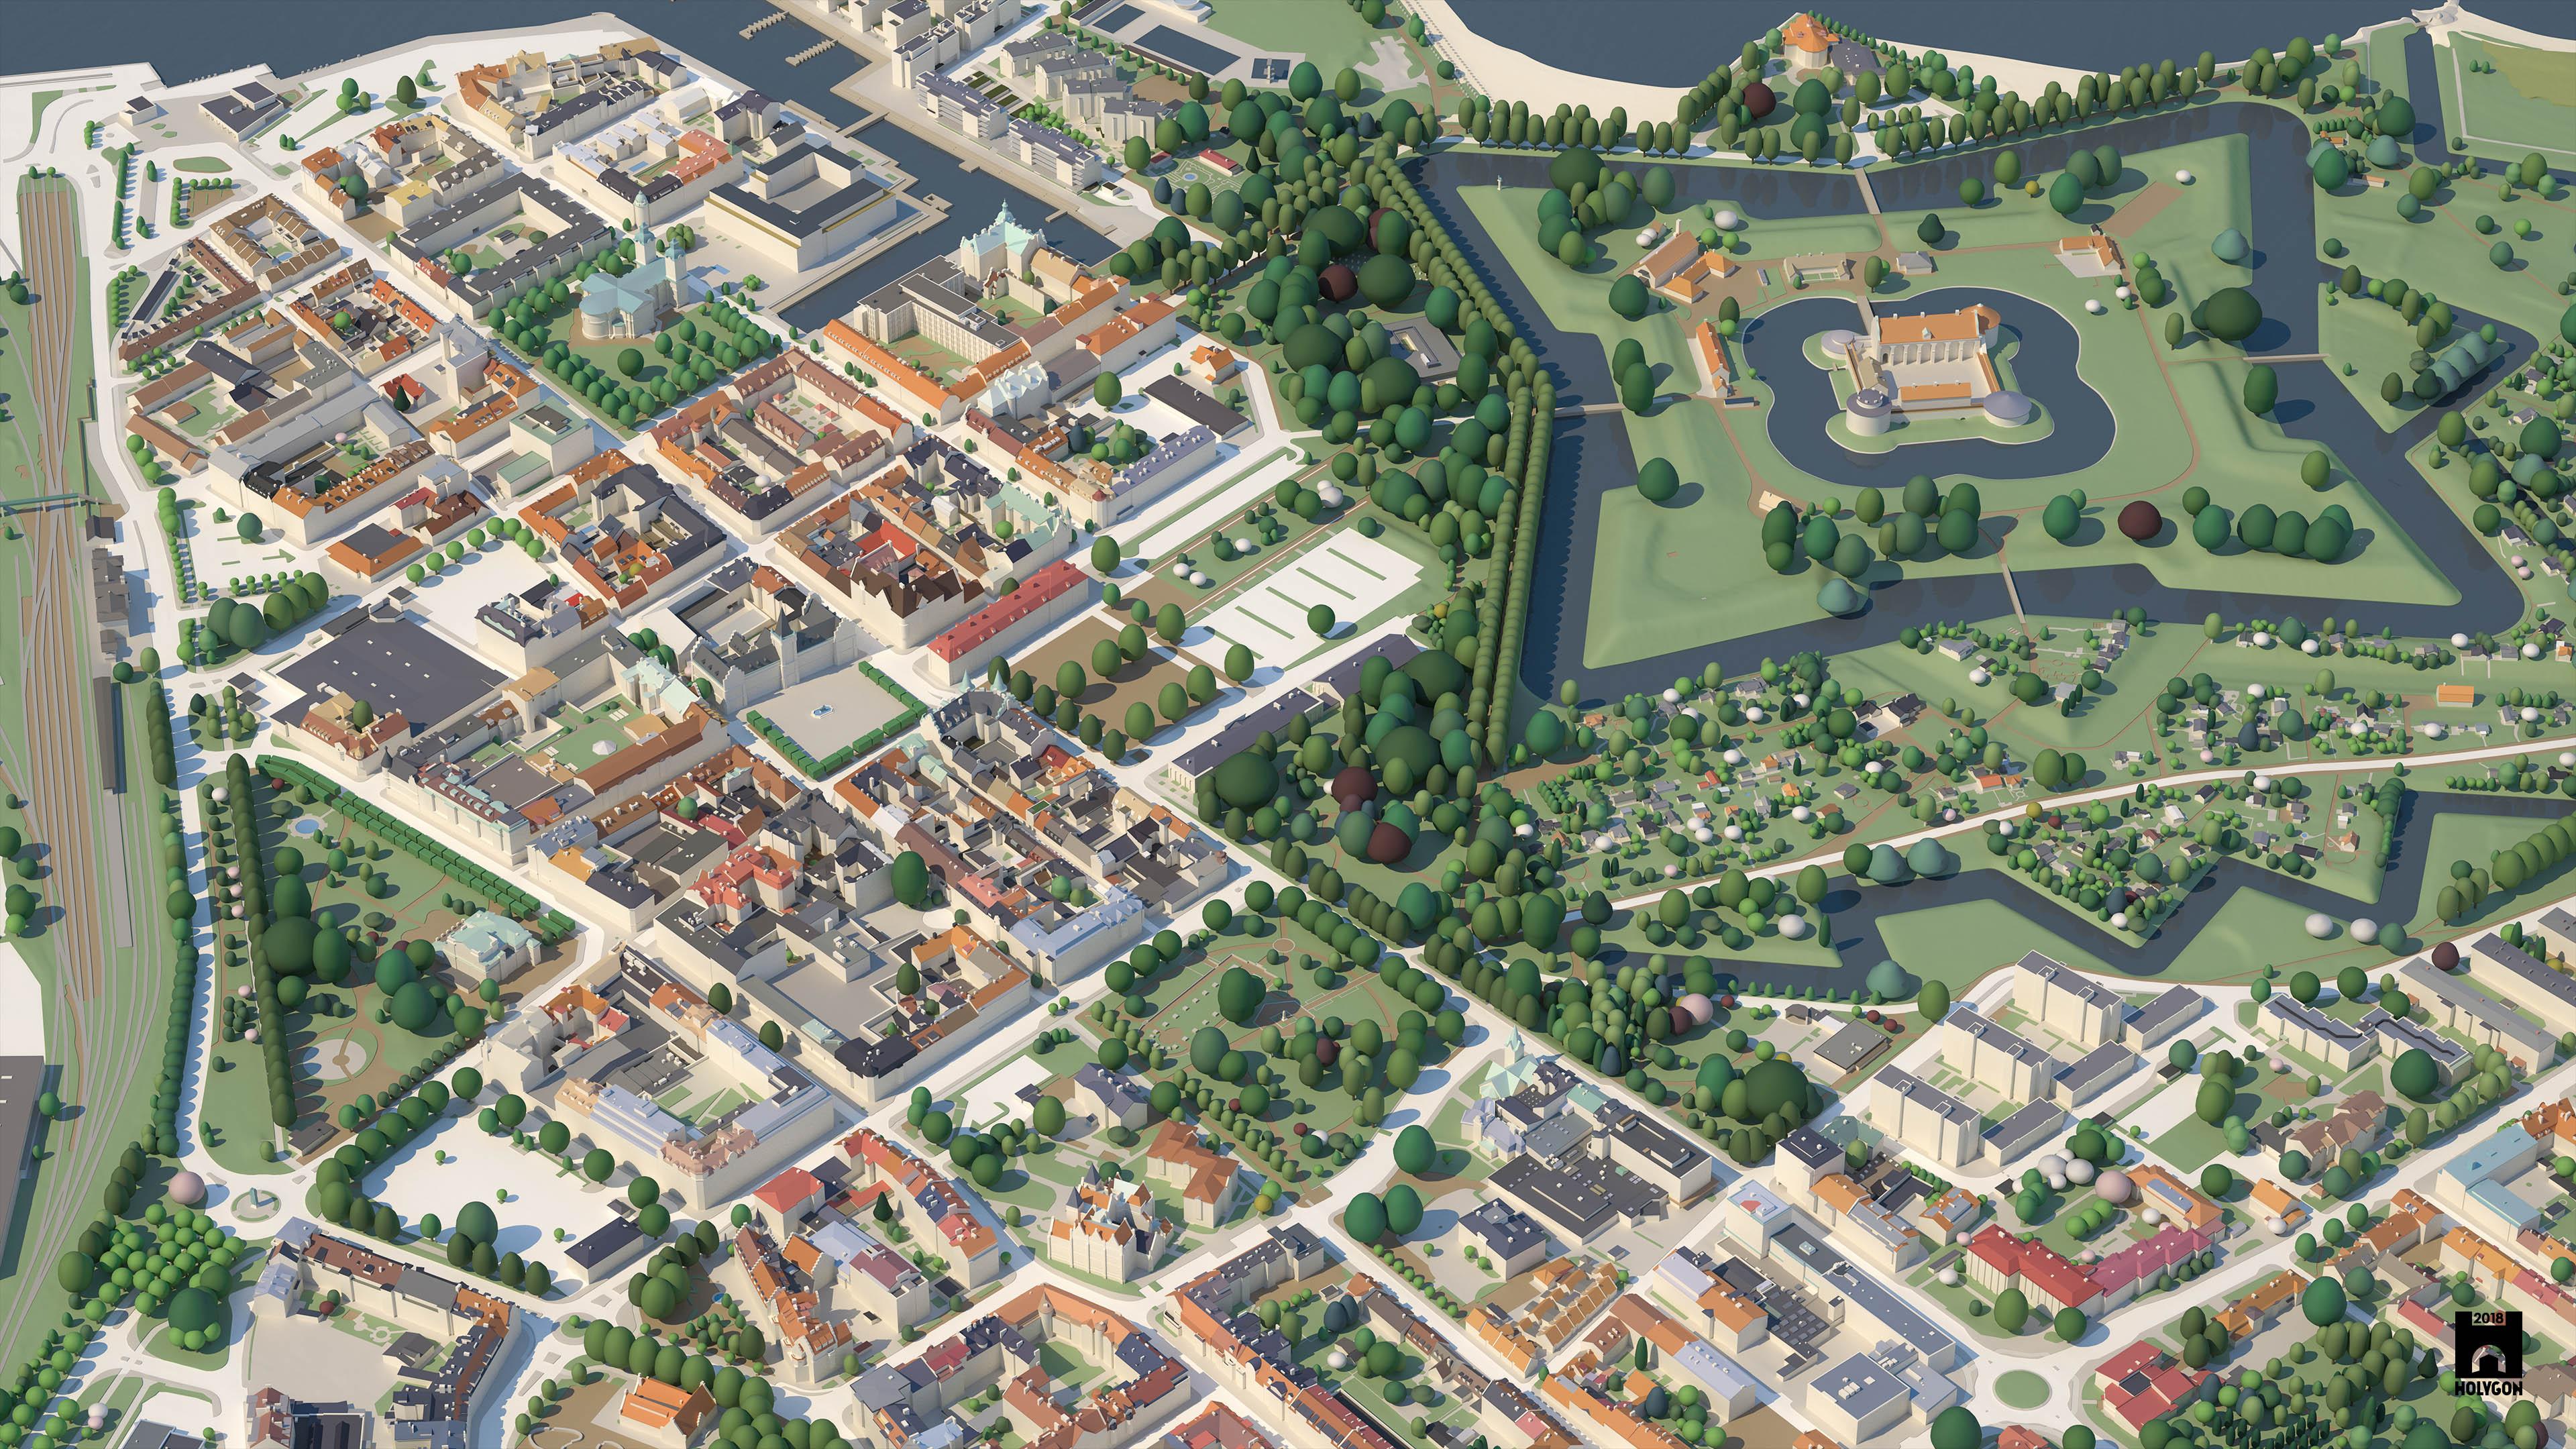 City model render